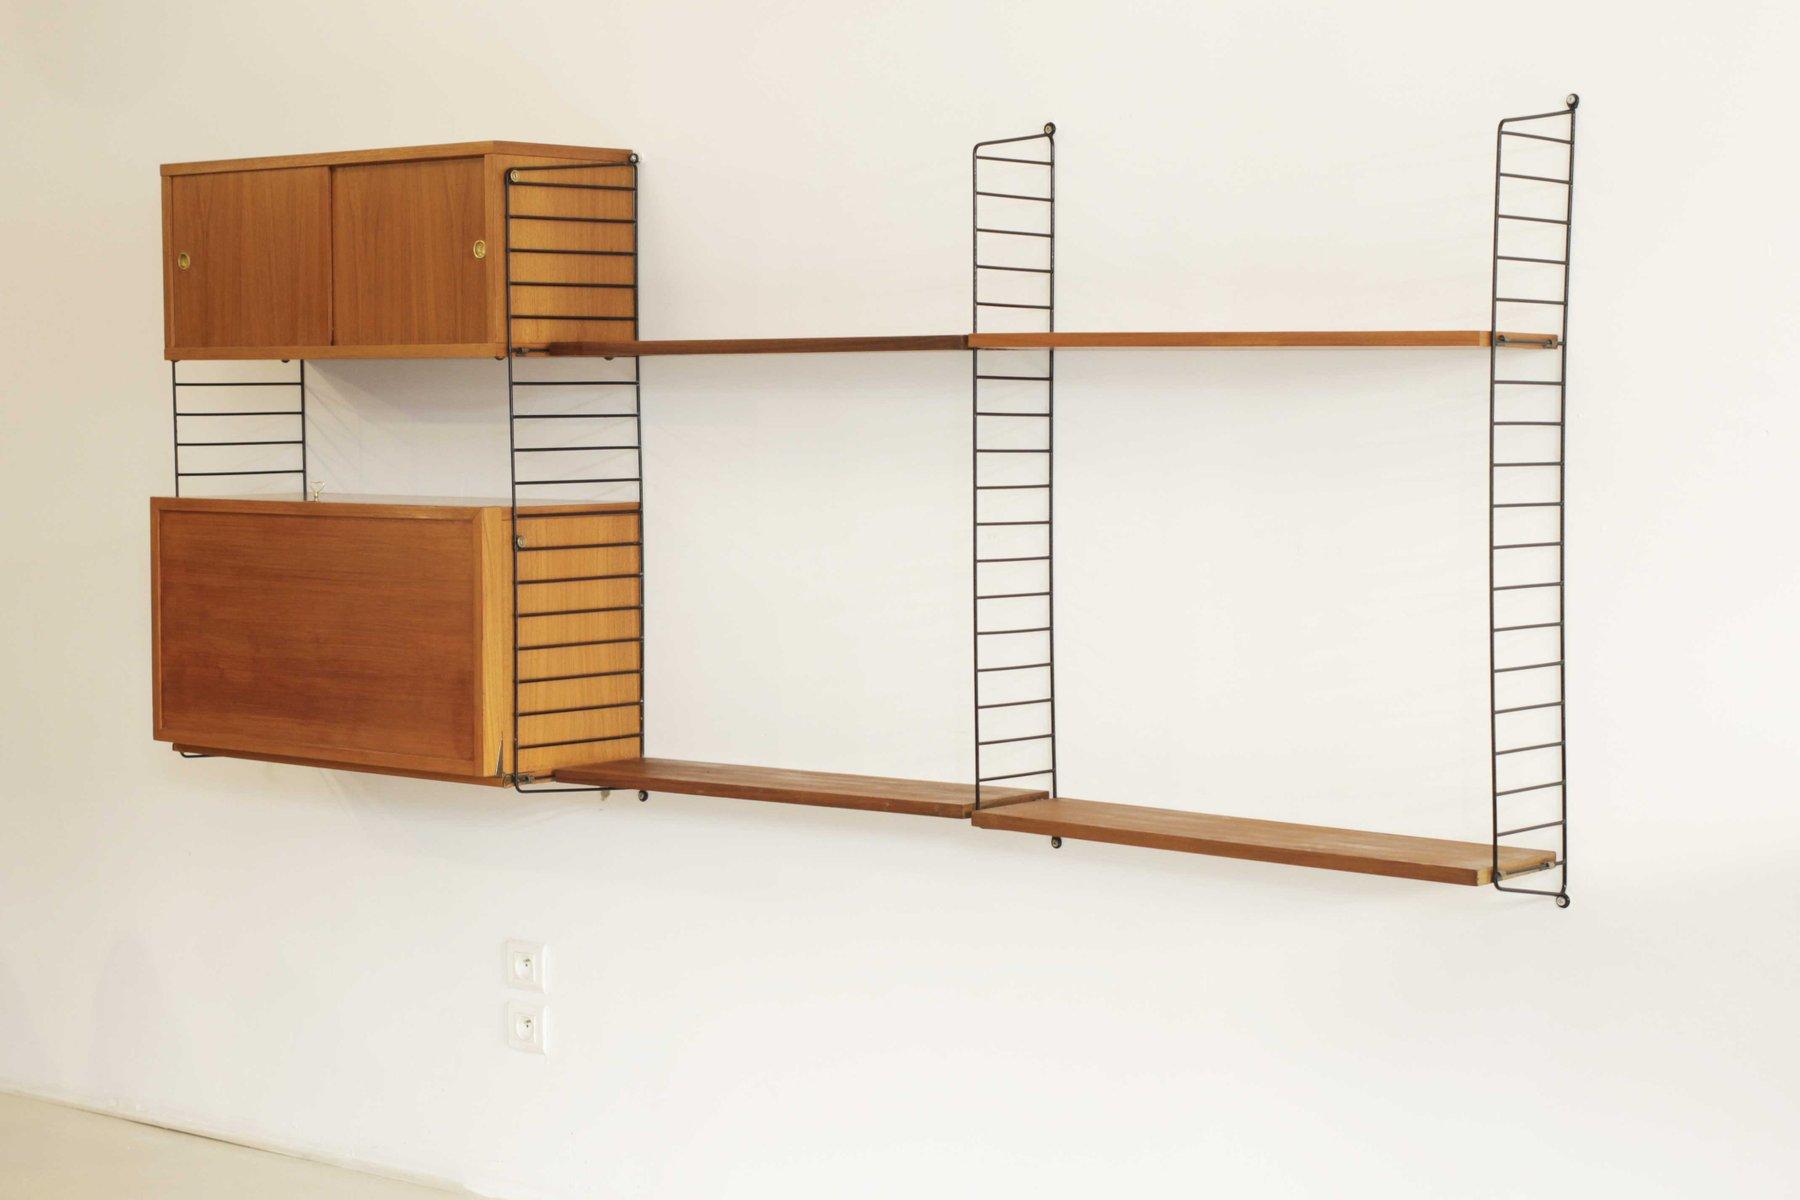 acd81bdaf007 Shelving Unit by Kajsa & Nils Strinning for String, 1950s for sale ...